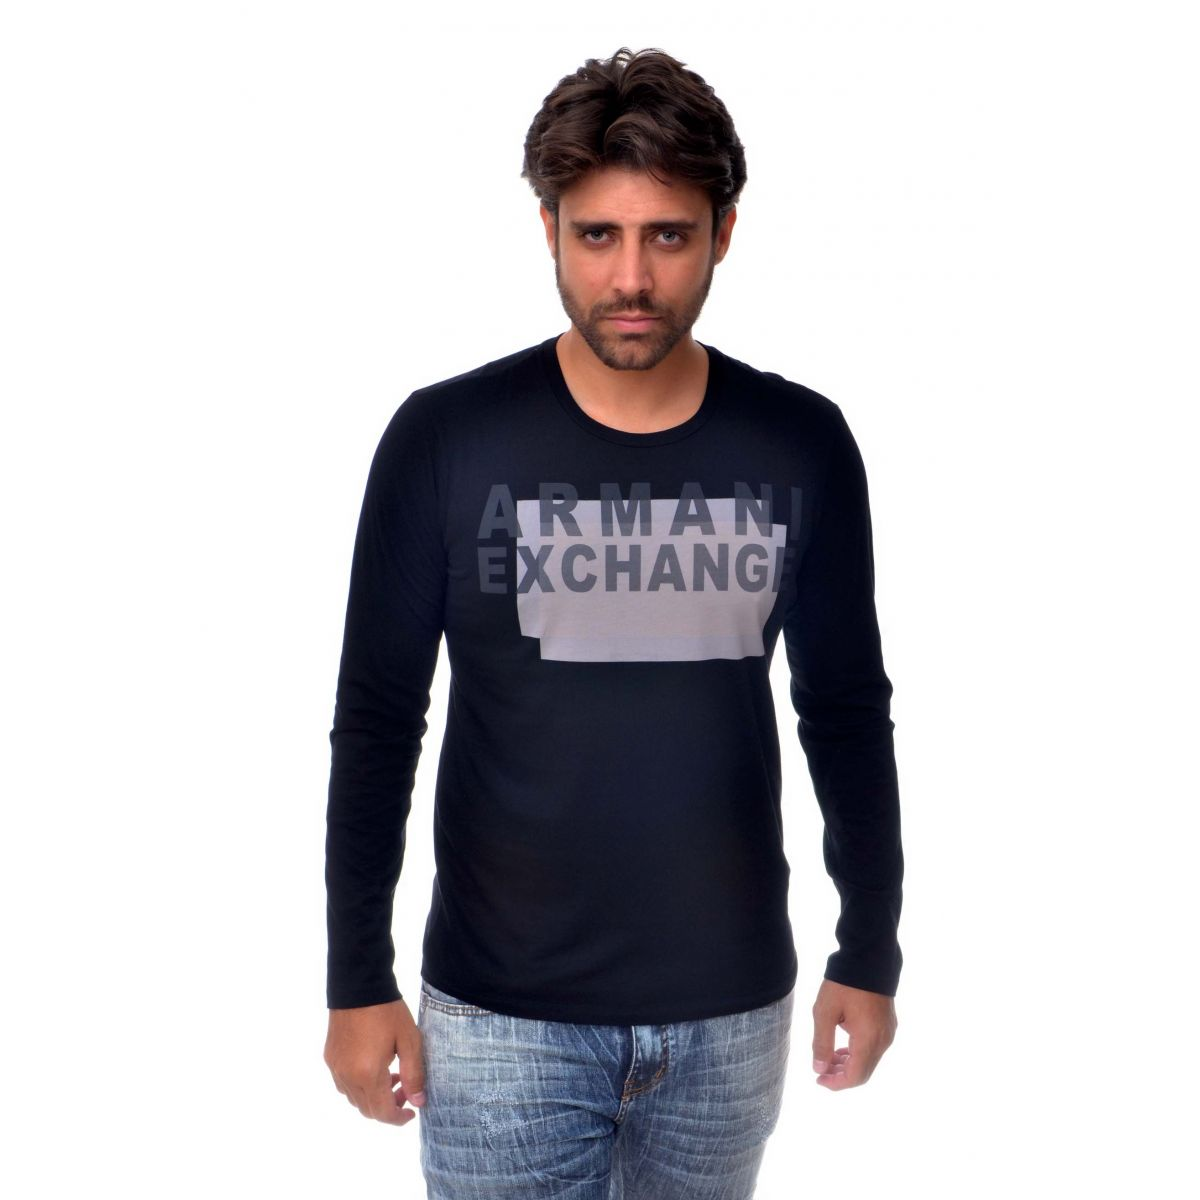 Camiseta Manga longa Armani Exchange Box Preta  - Ca Brasileira